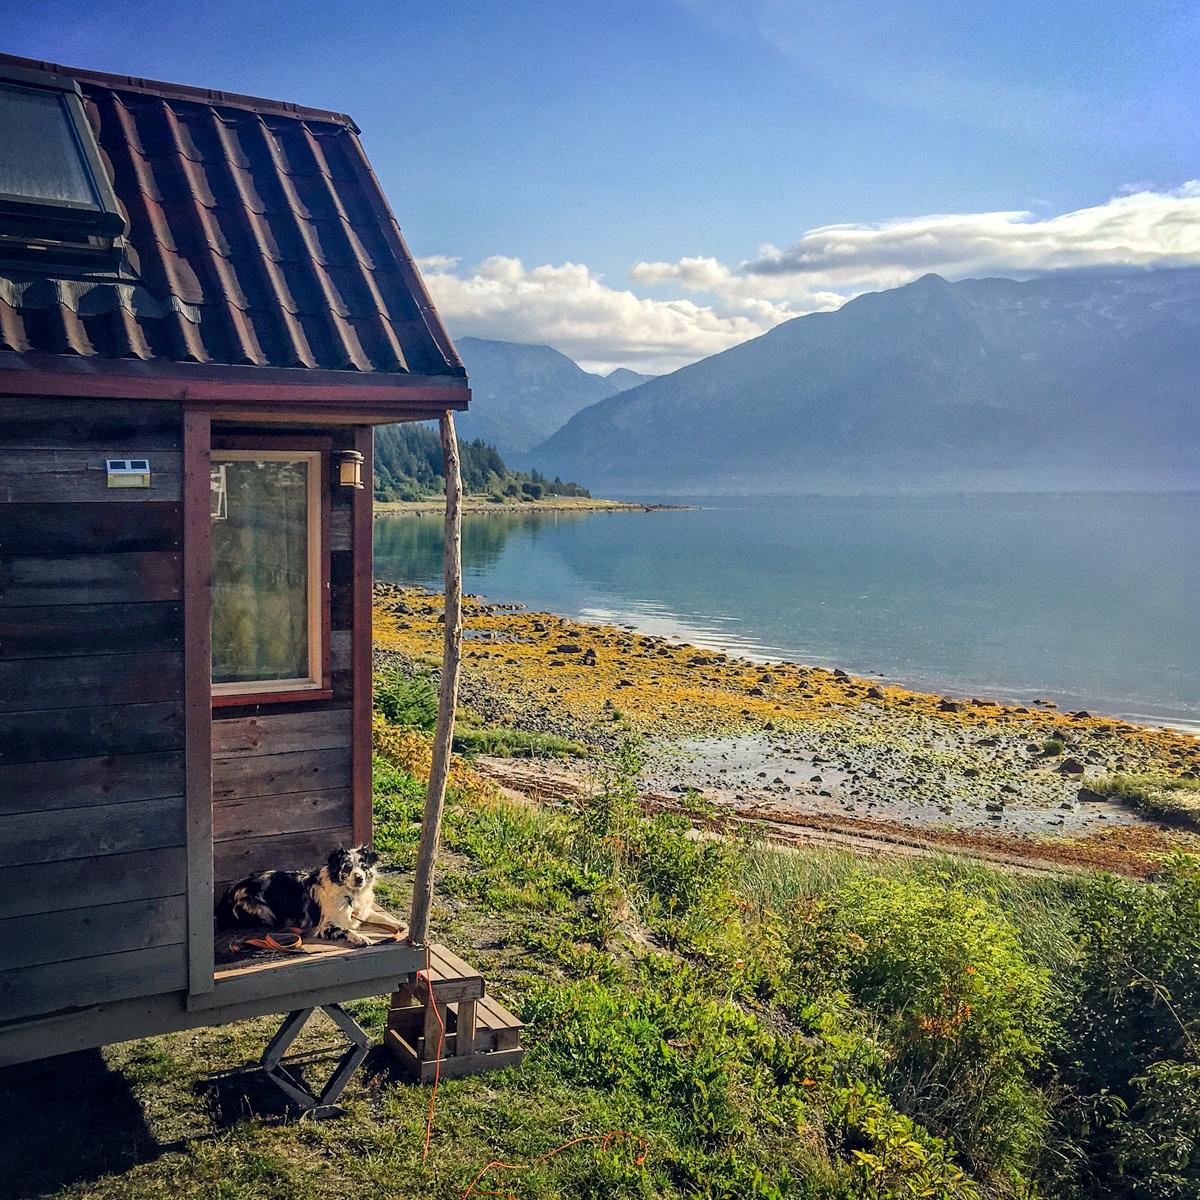 Haines, AK: Speedy the Bear & a Hammer Museum